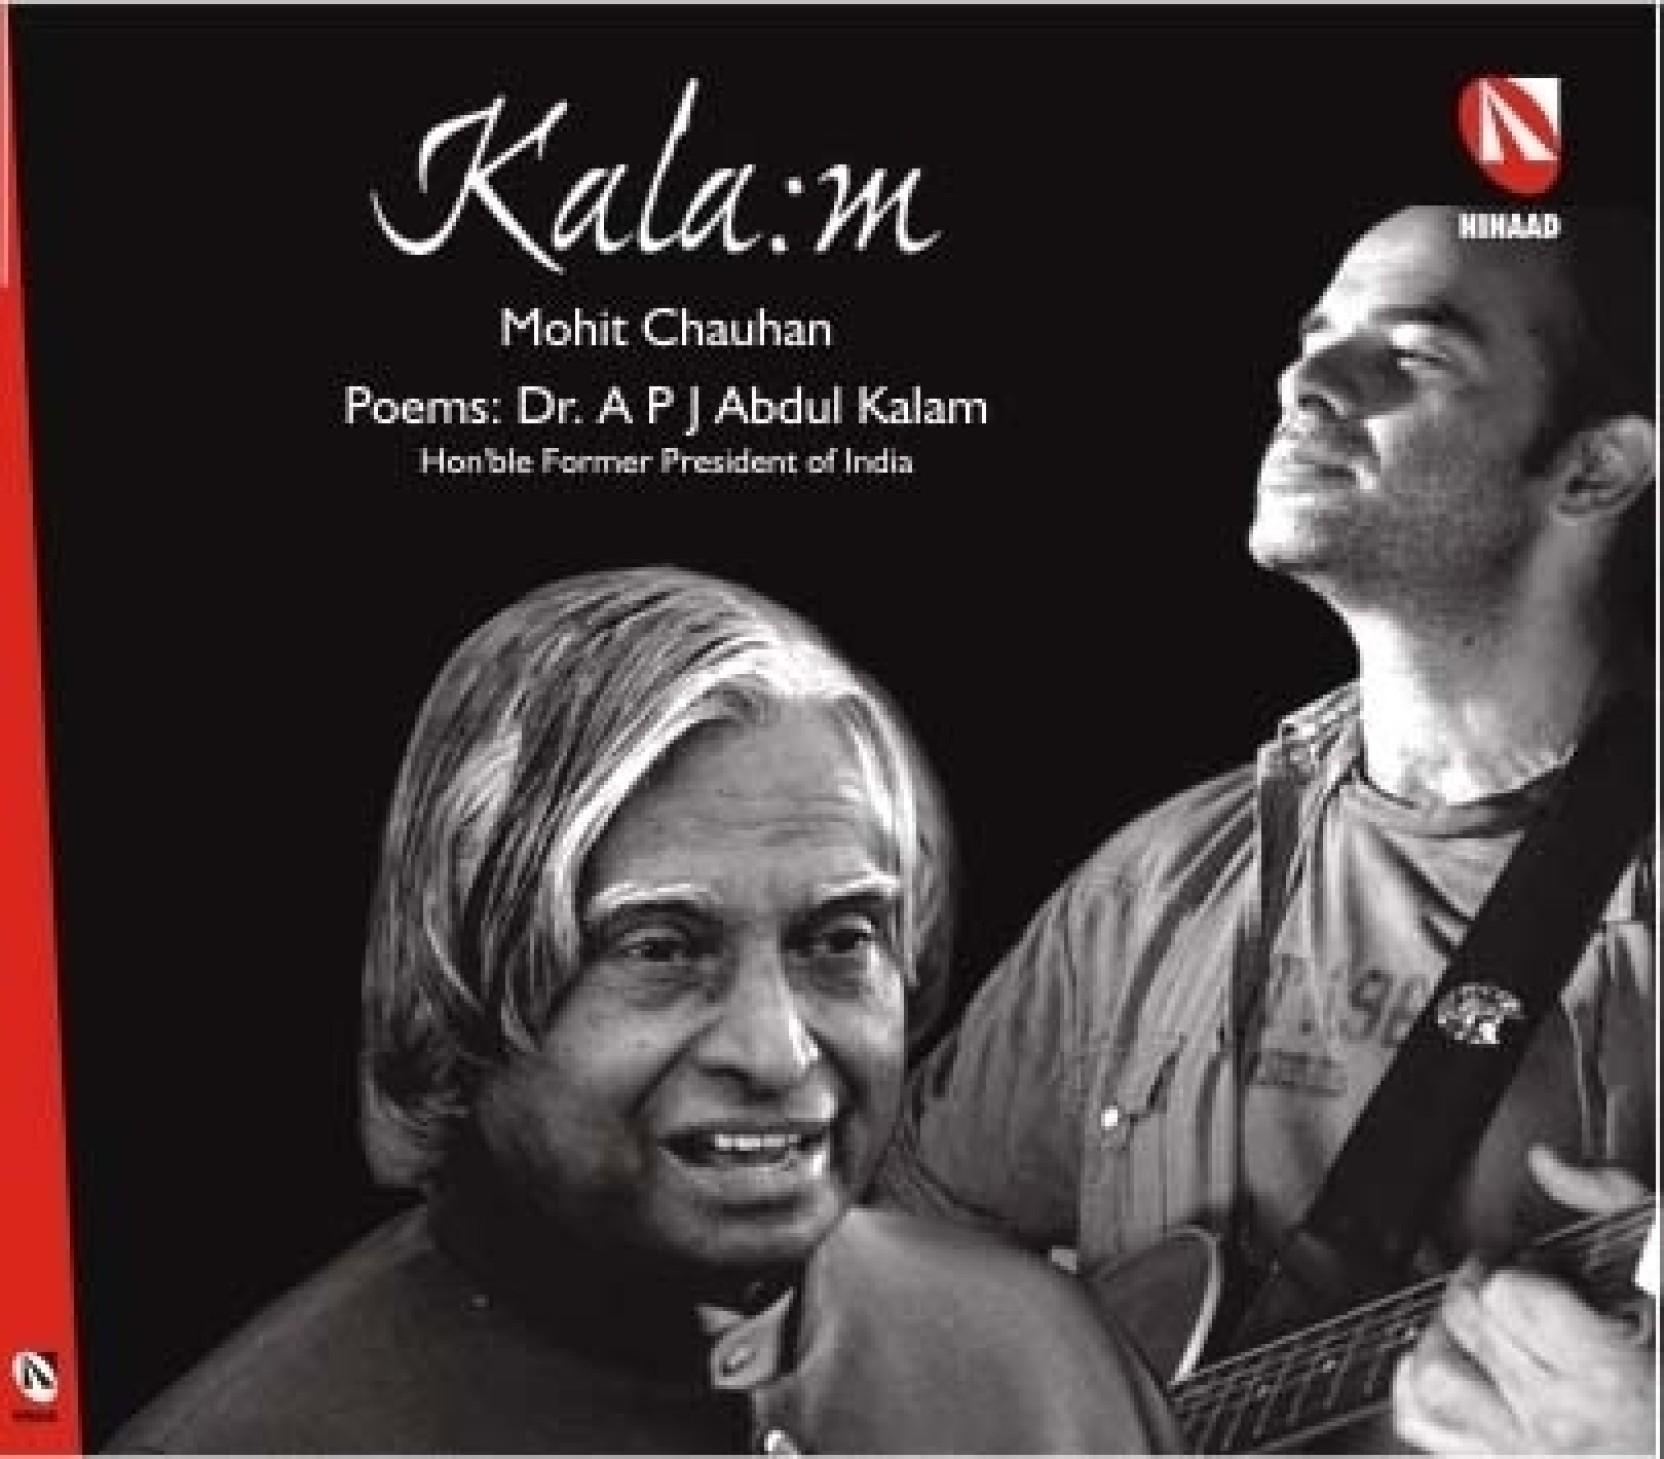 Kala:M (Poems : Dr. A. P. J. Abdul Kalam) Music Audio CD ...